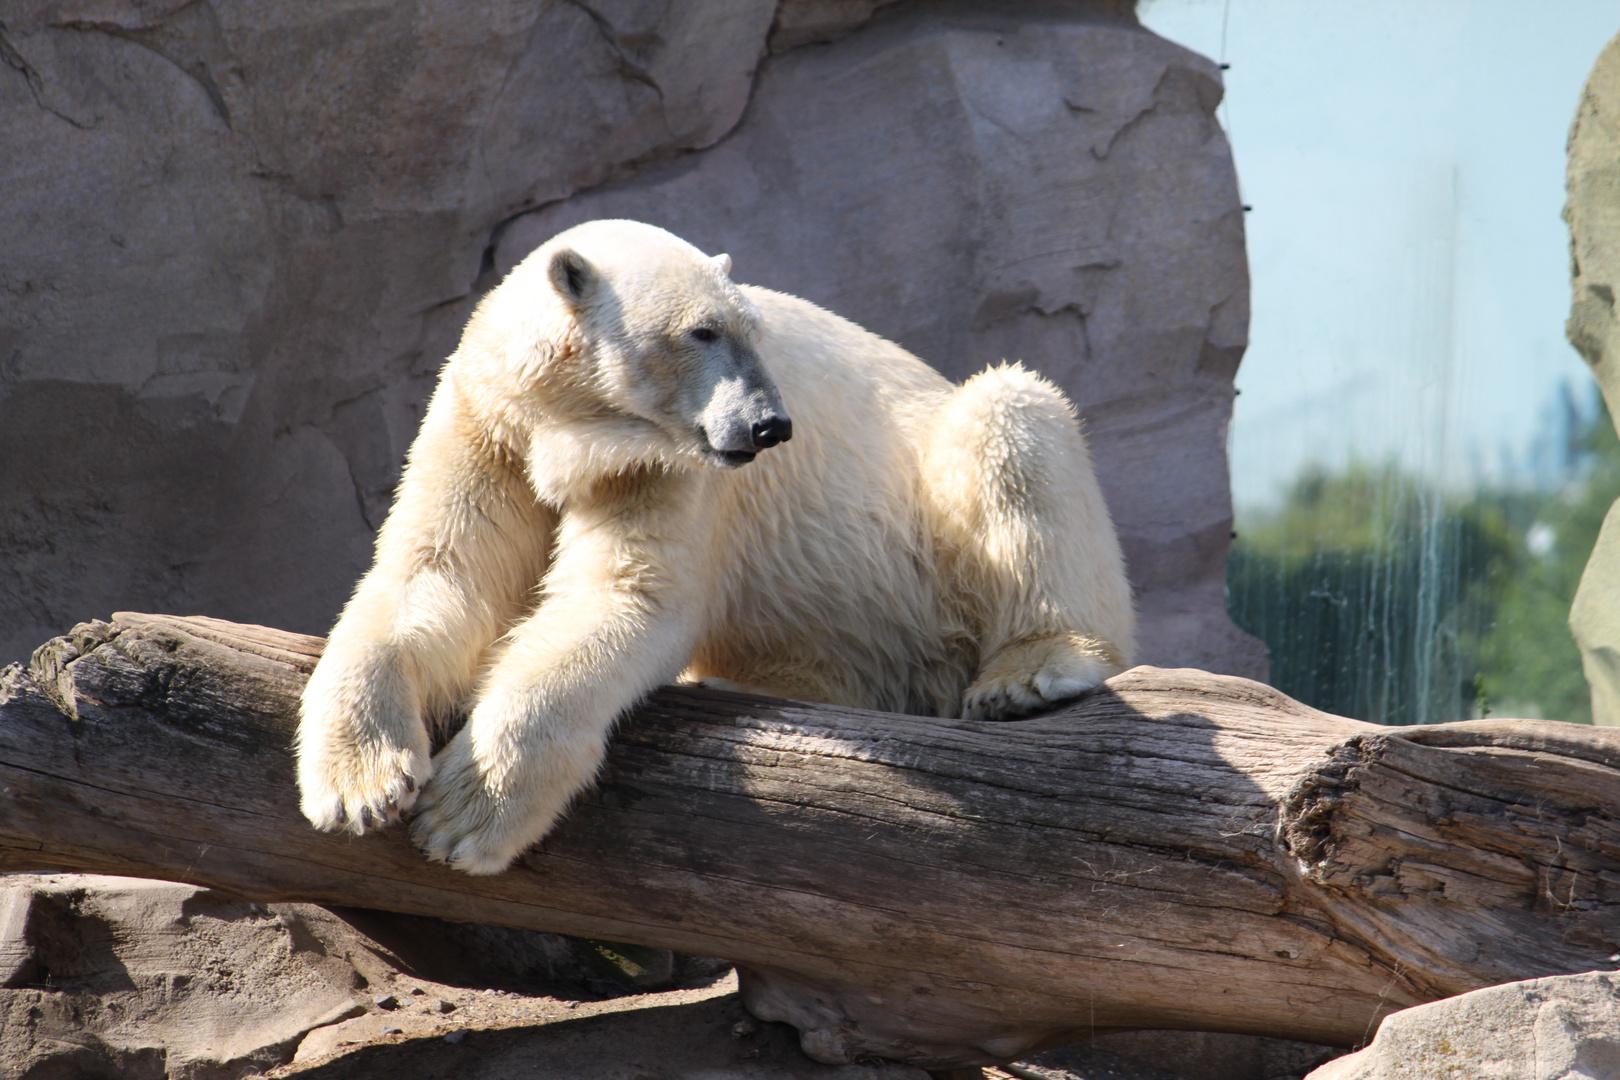 Eisbär im Meereszoo Bremerhaven